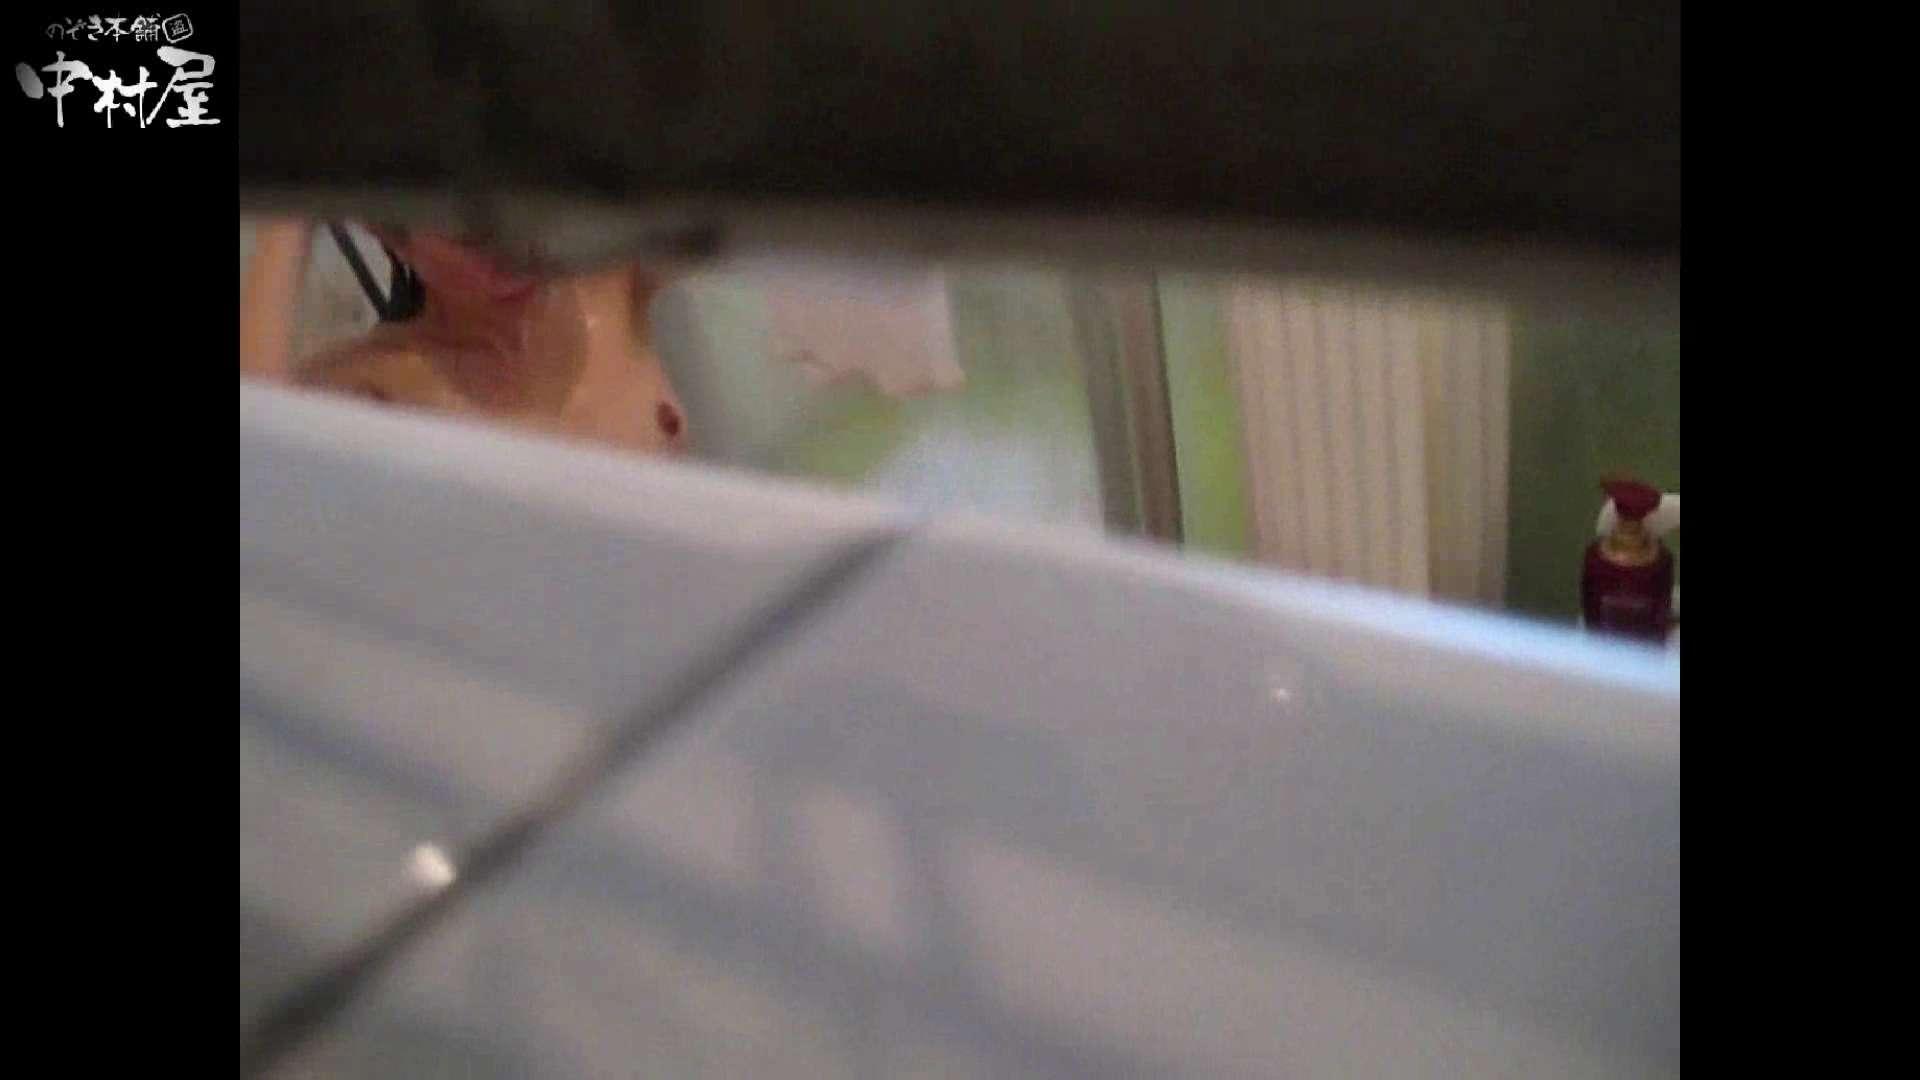 民家風呂専門盗撮師の超危険映像 vol.014後編 エロい美少女 セックス無修正動画無料 113PIX 44